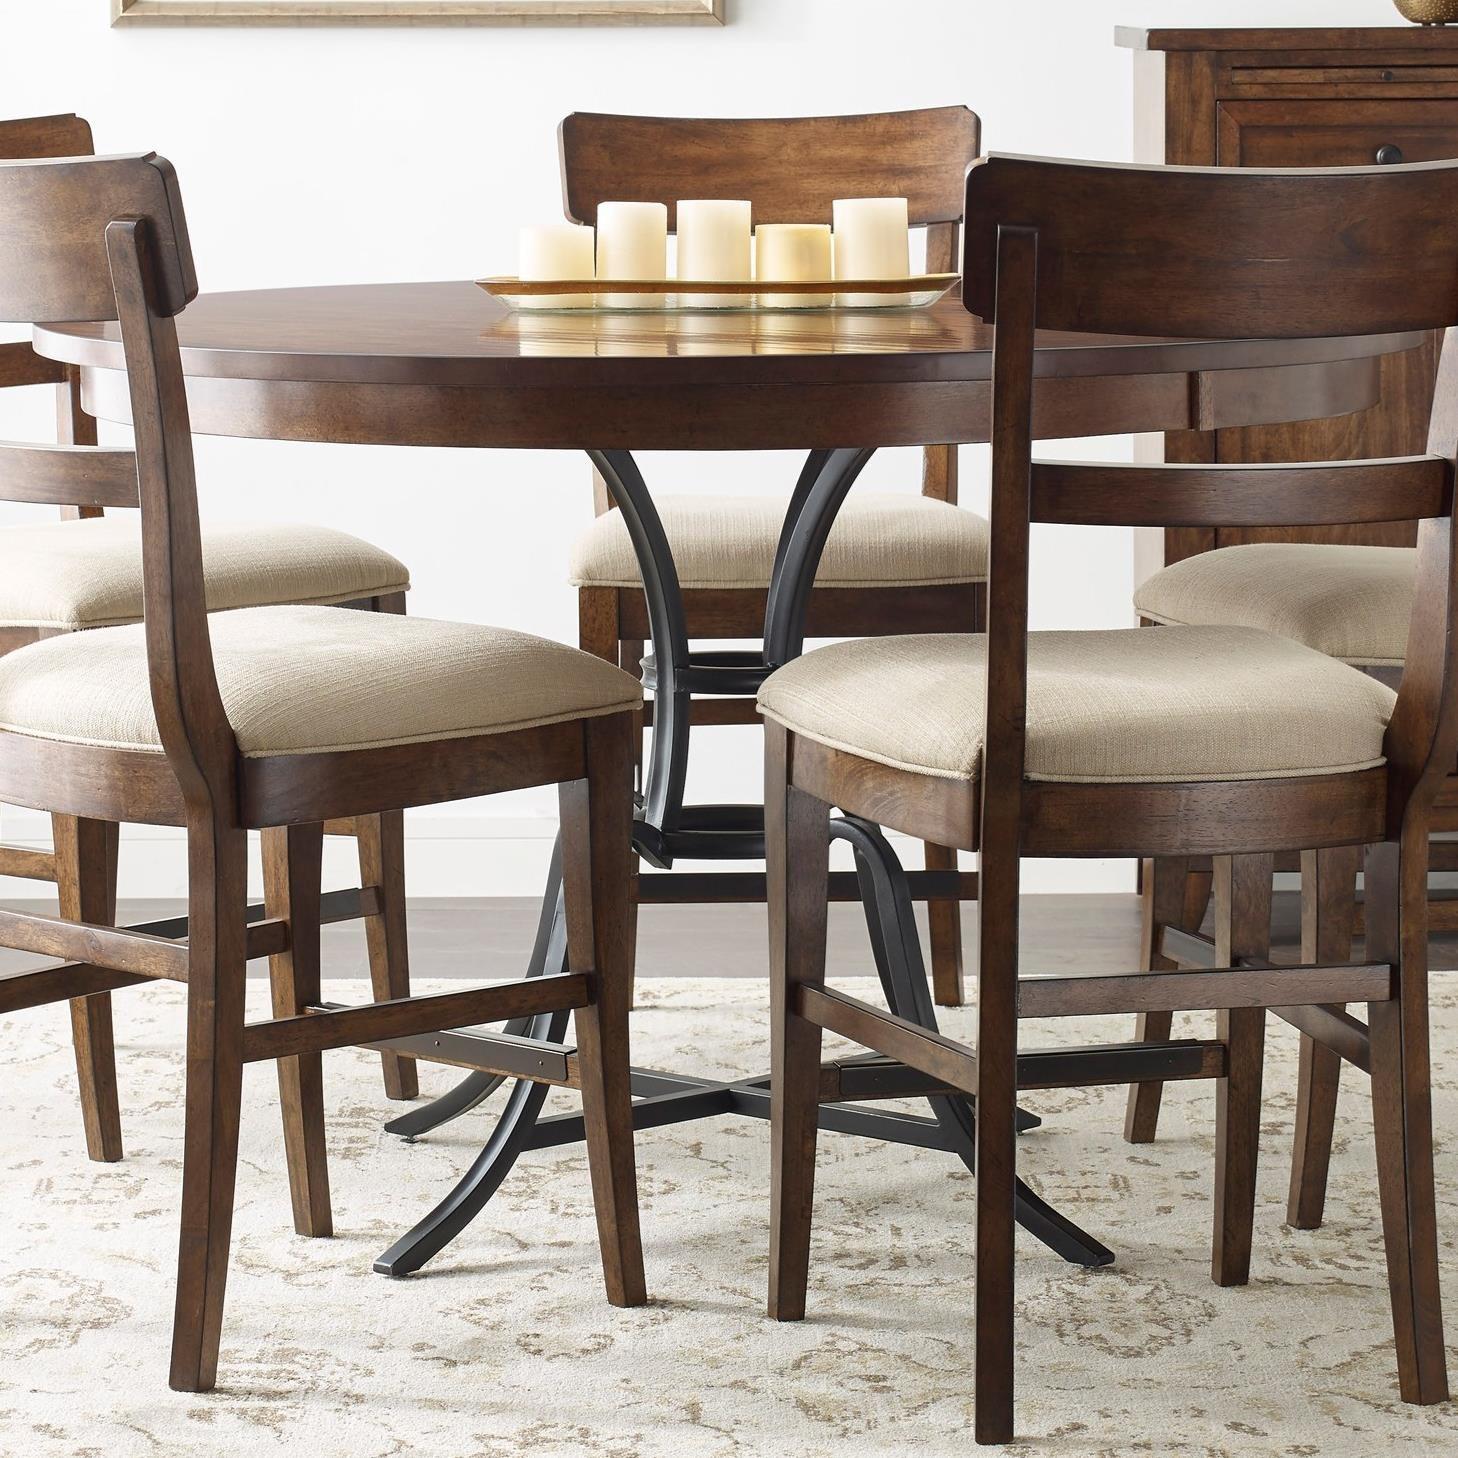 Kincaid Furniture The Nook54 ...